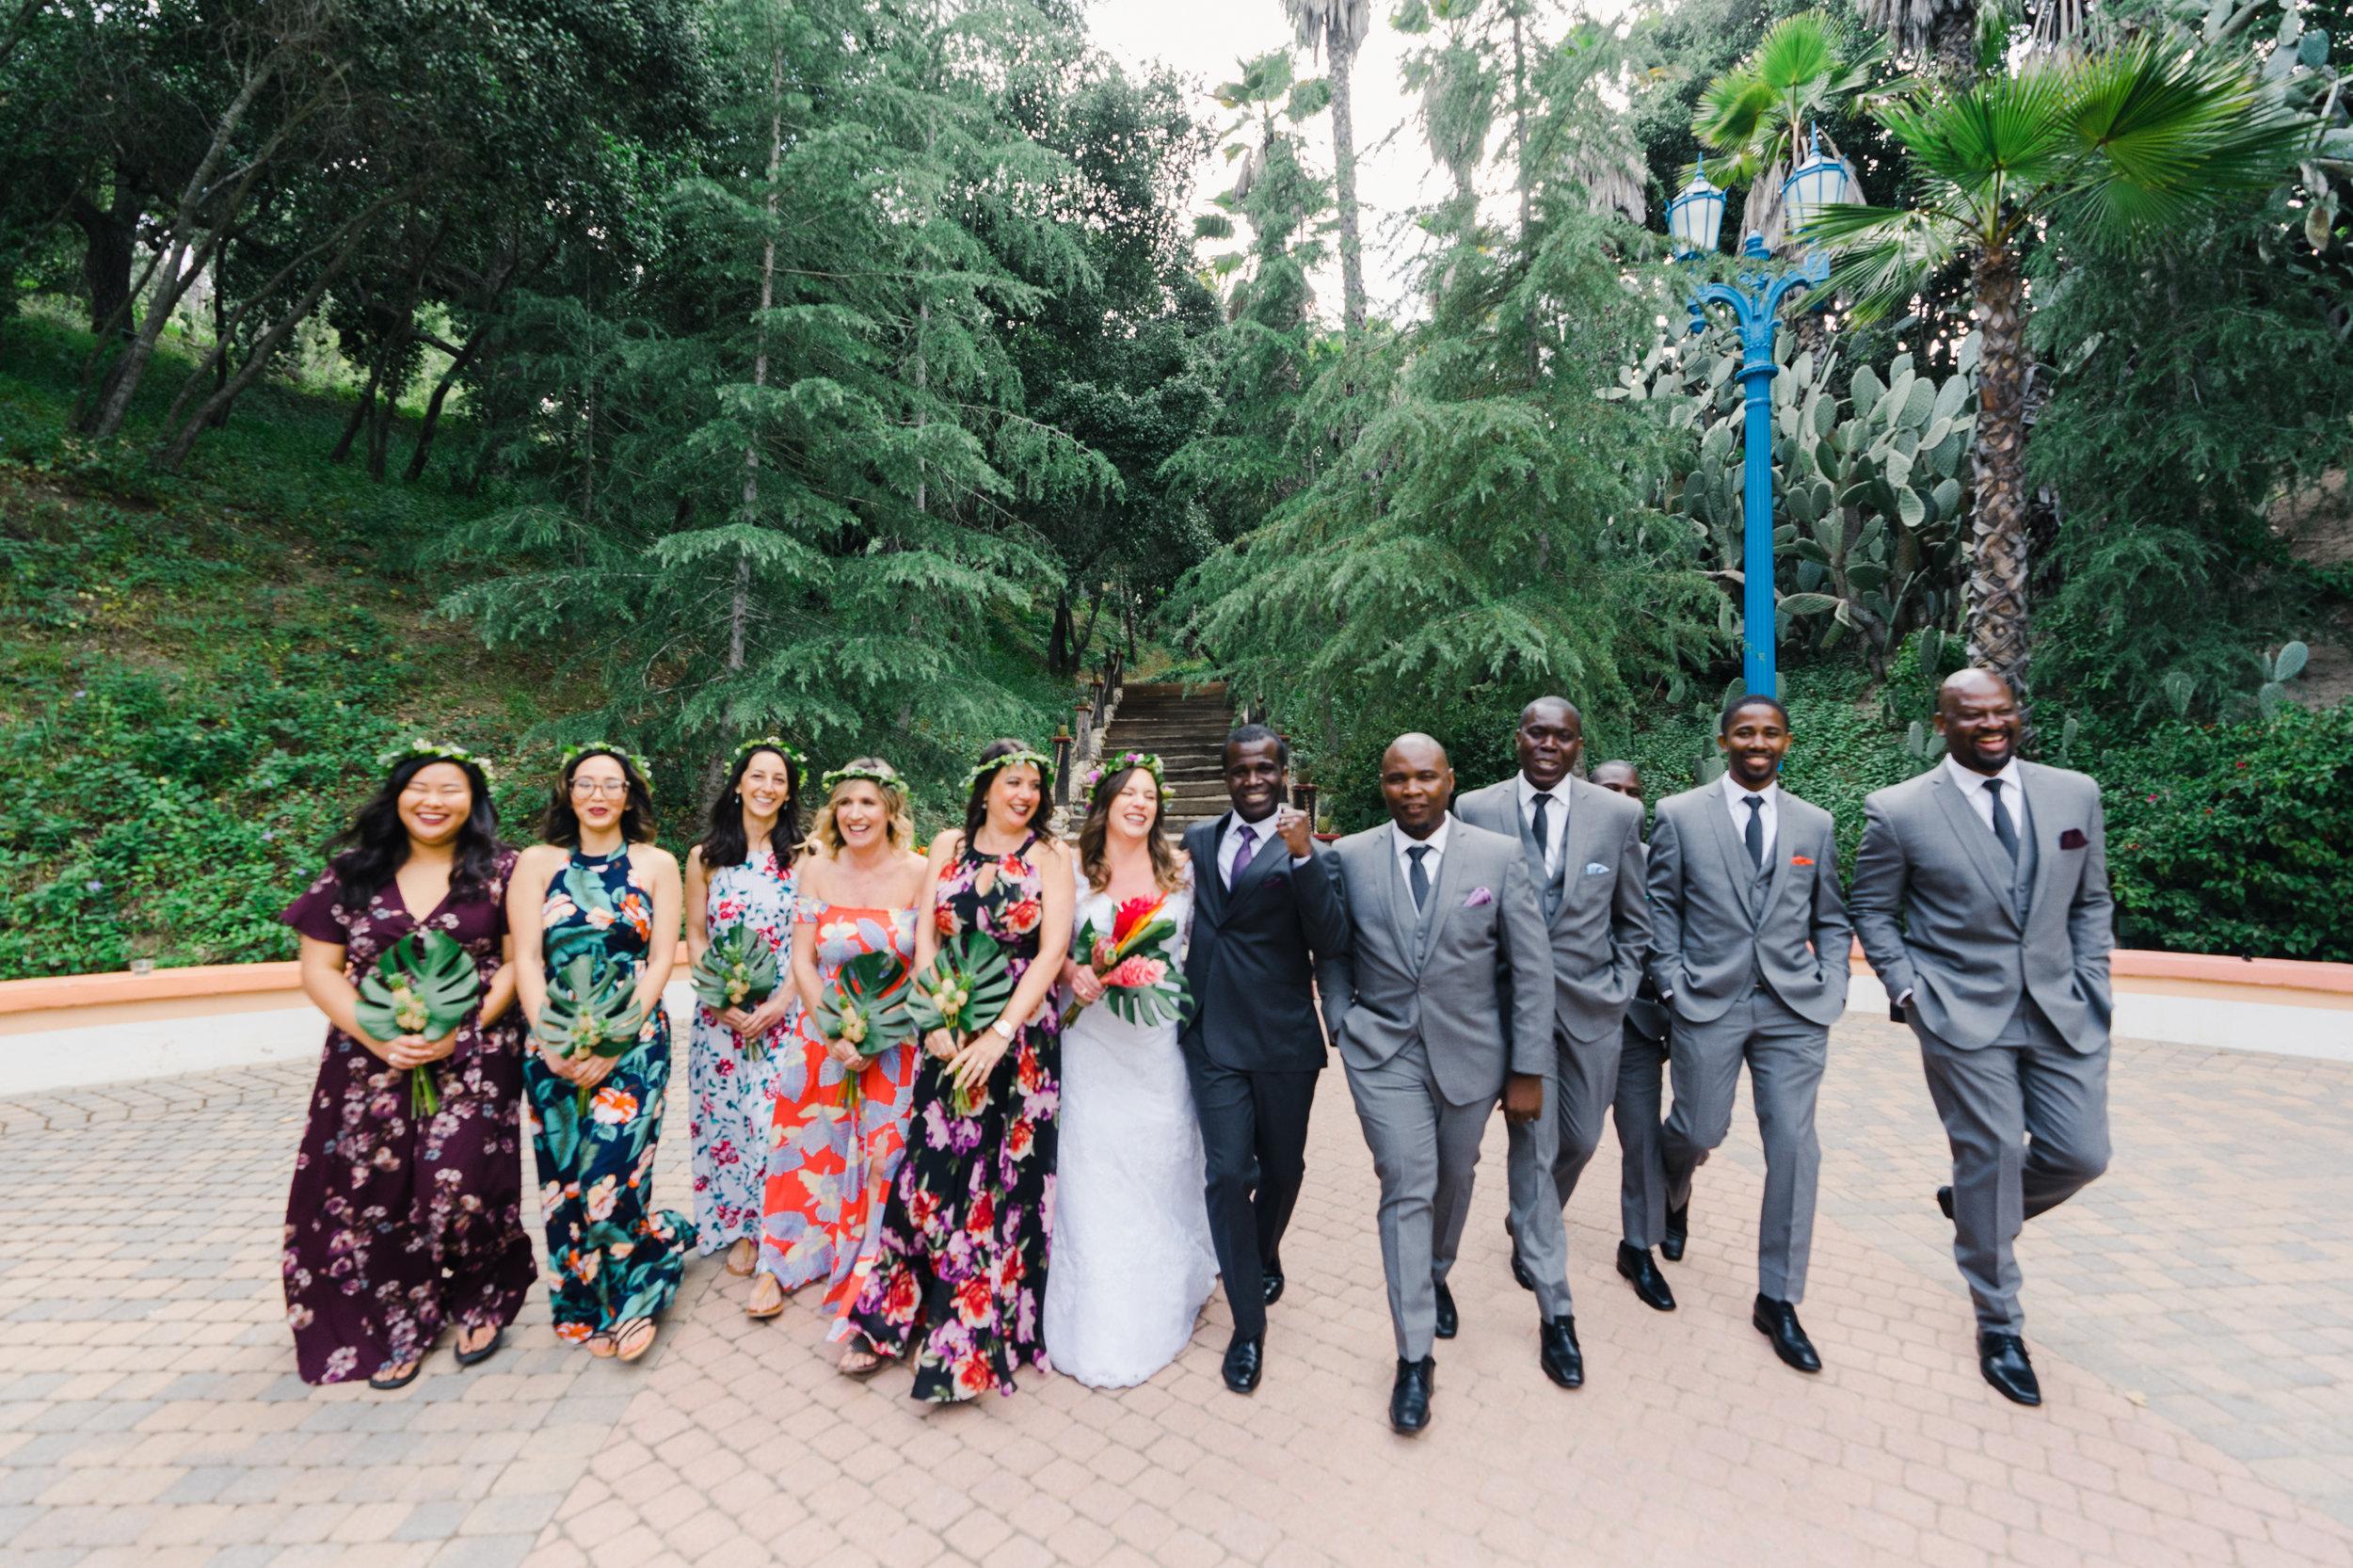 rancho-las-lomas-wedding-kelsey-sim_0152.JPG